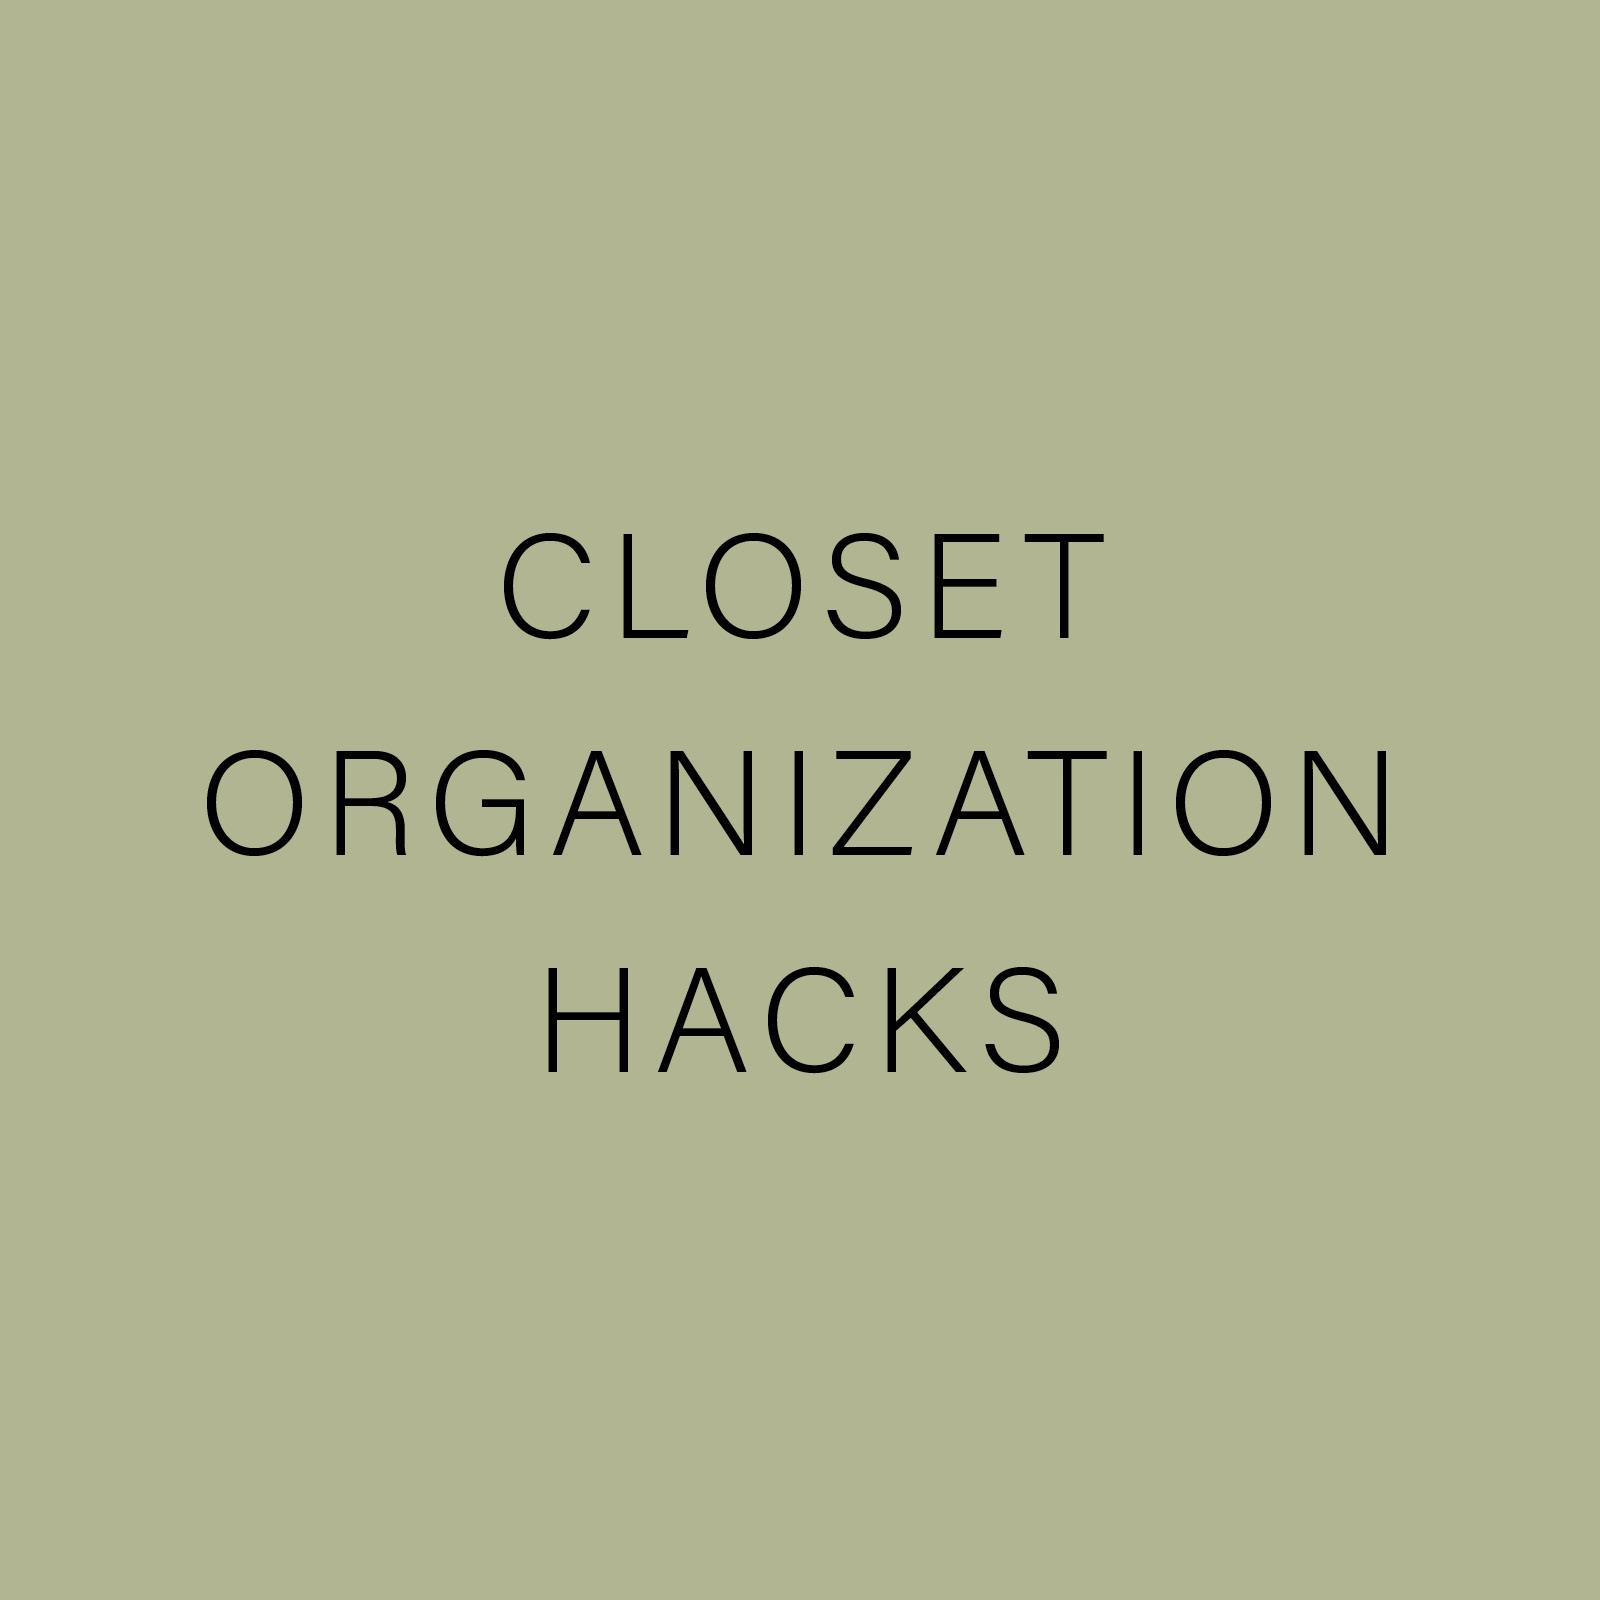 CLOSET ORGANIZATION HACKS.jpg